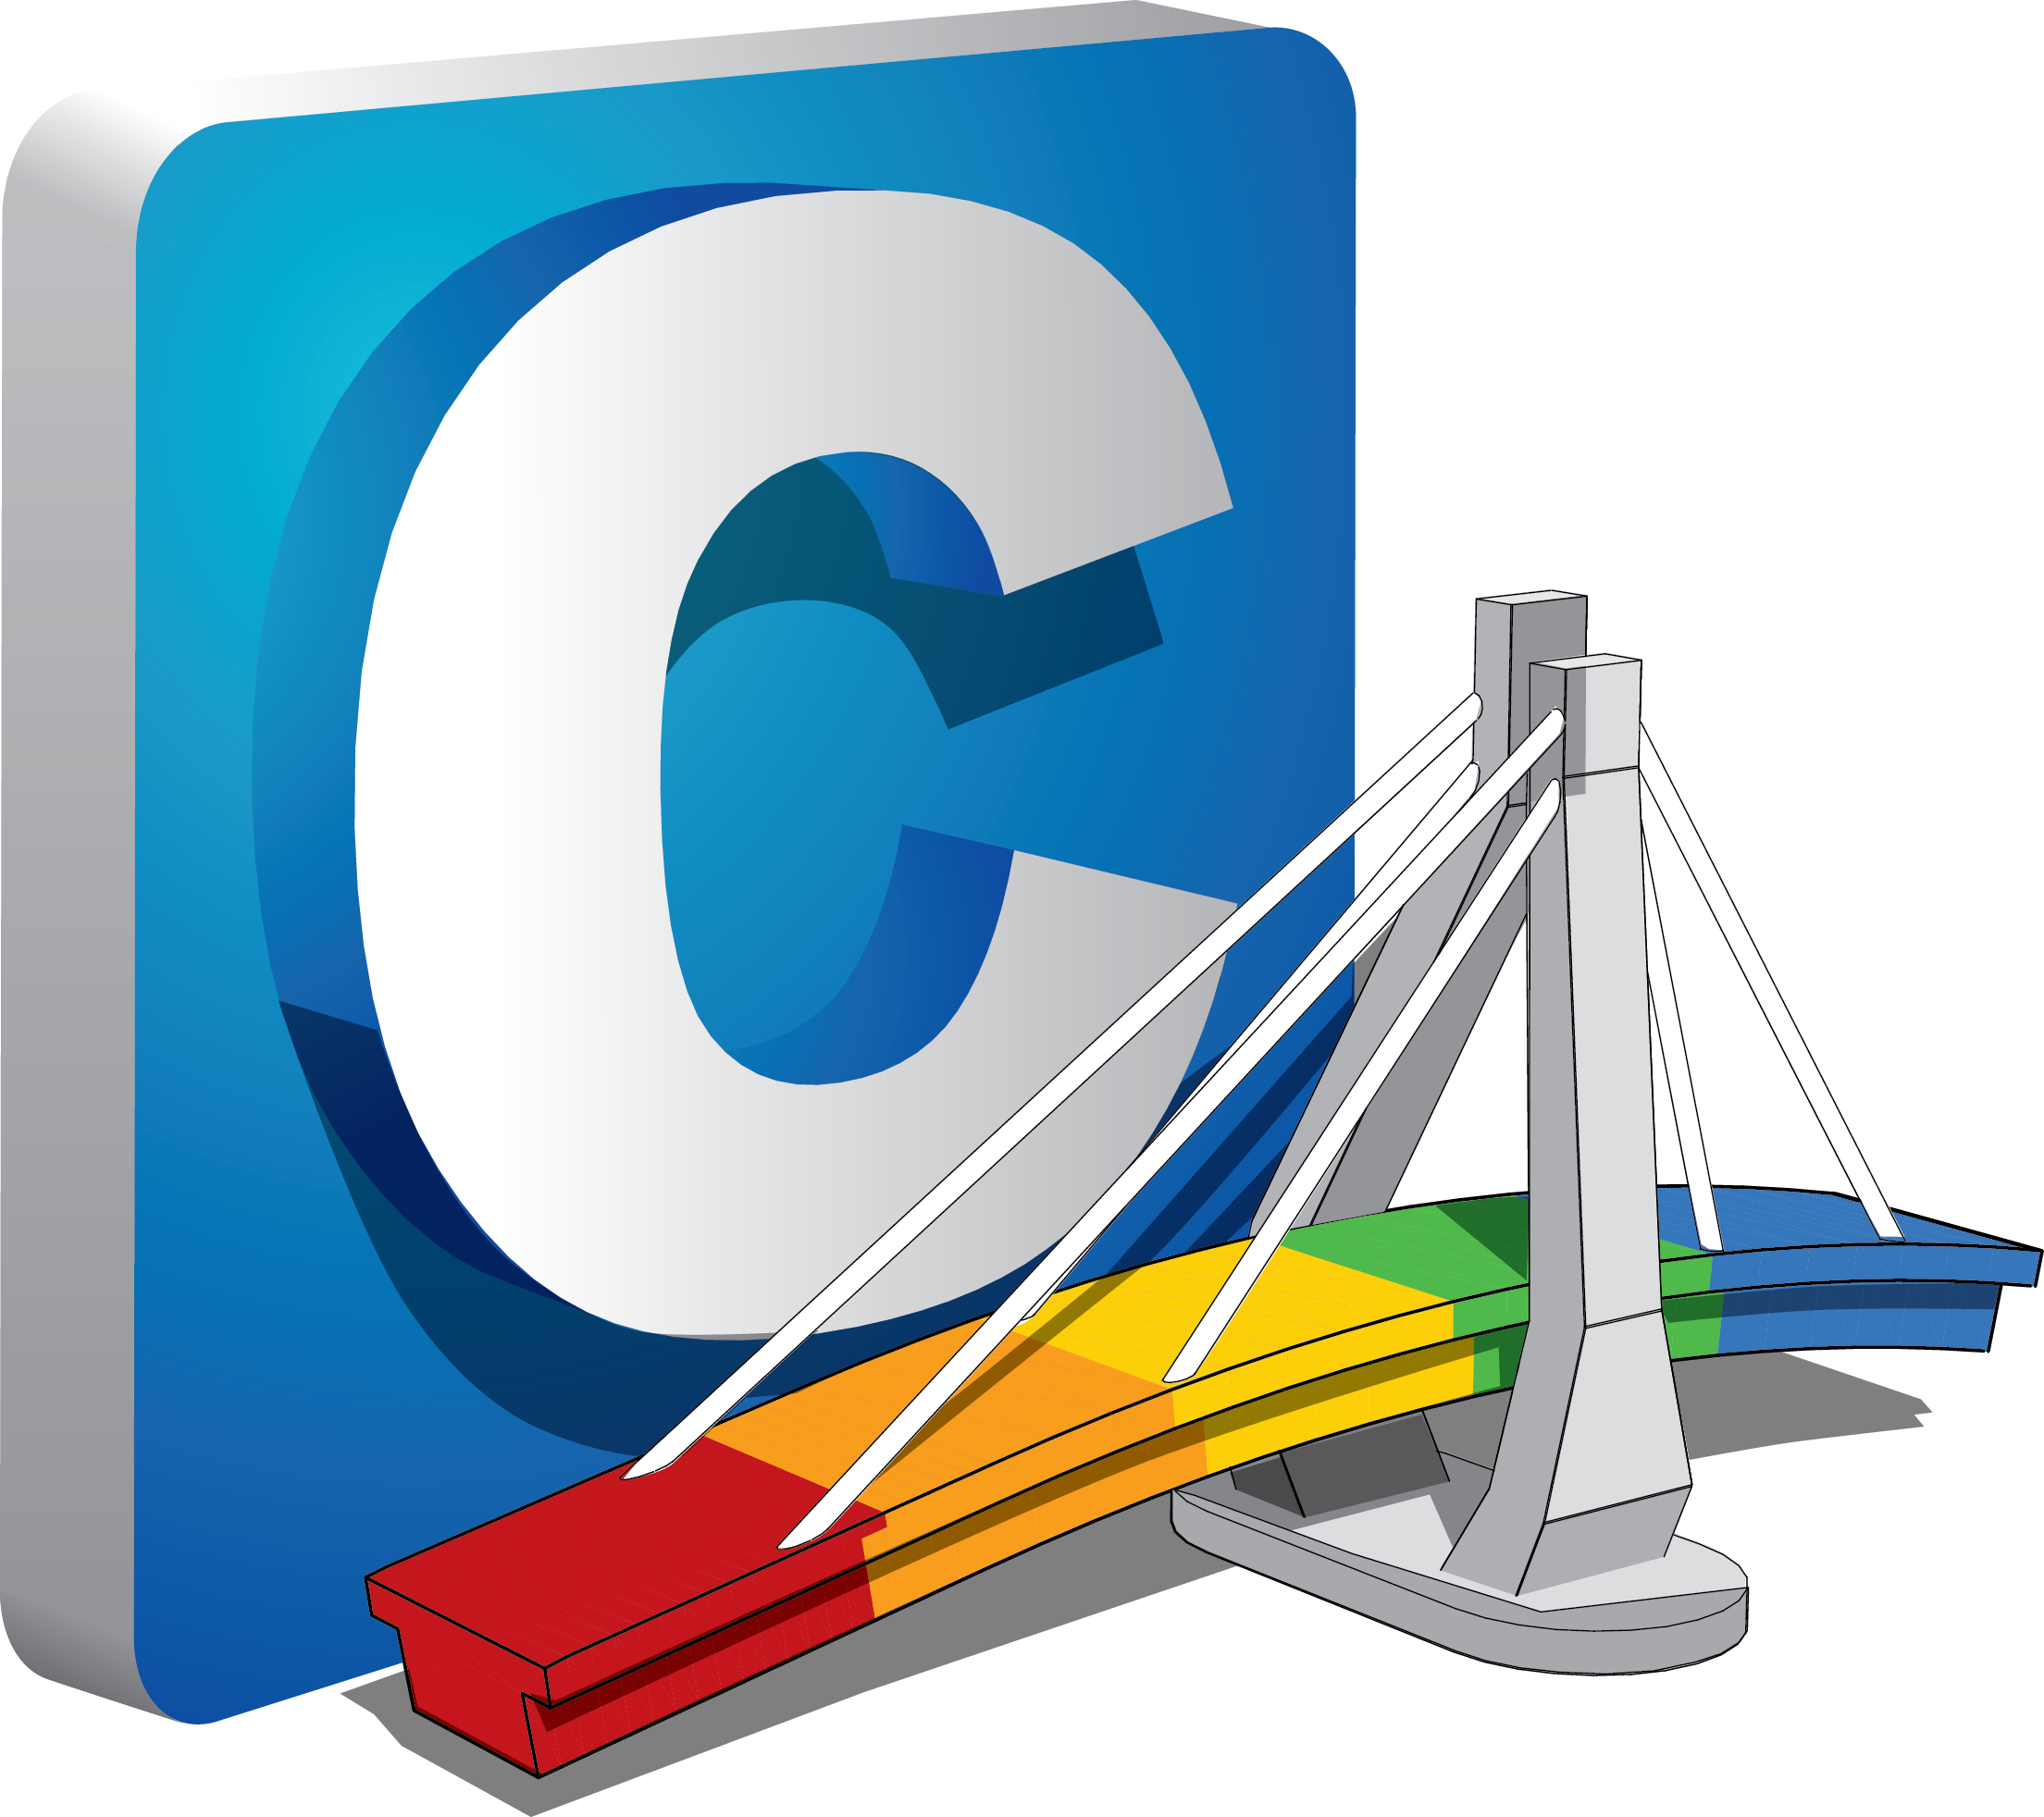 midas logos-06